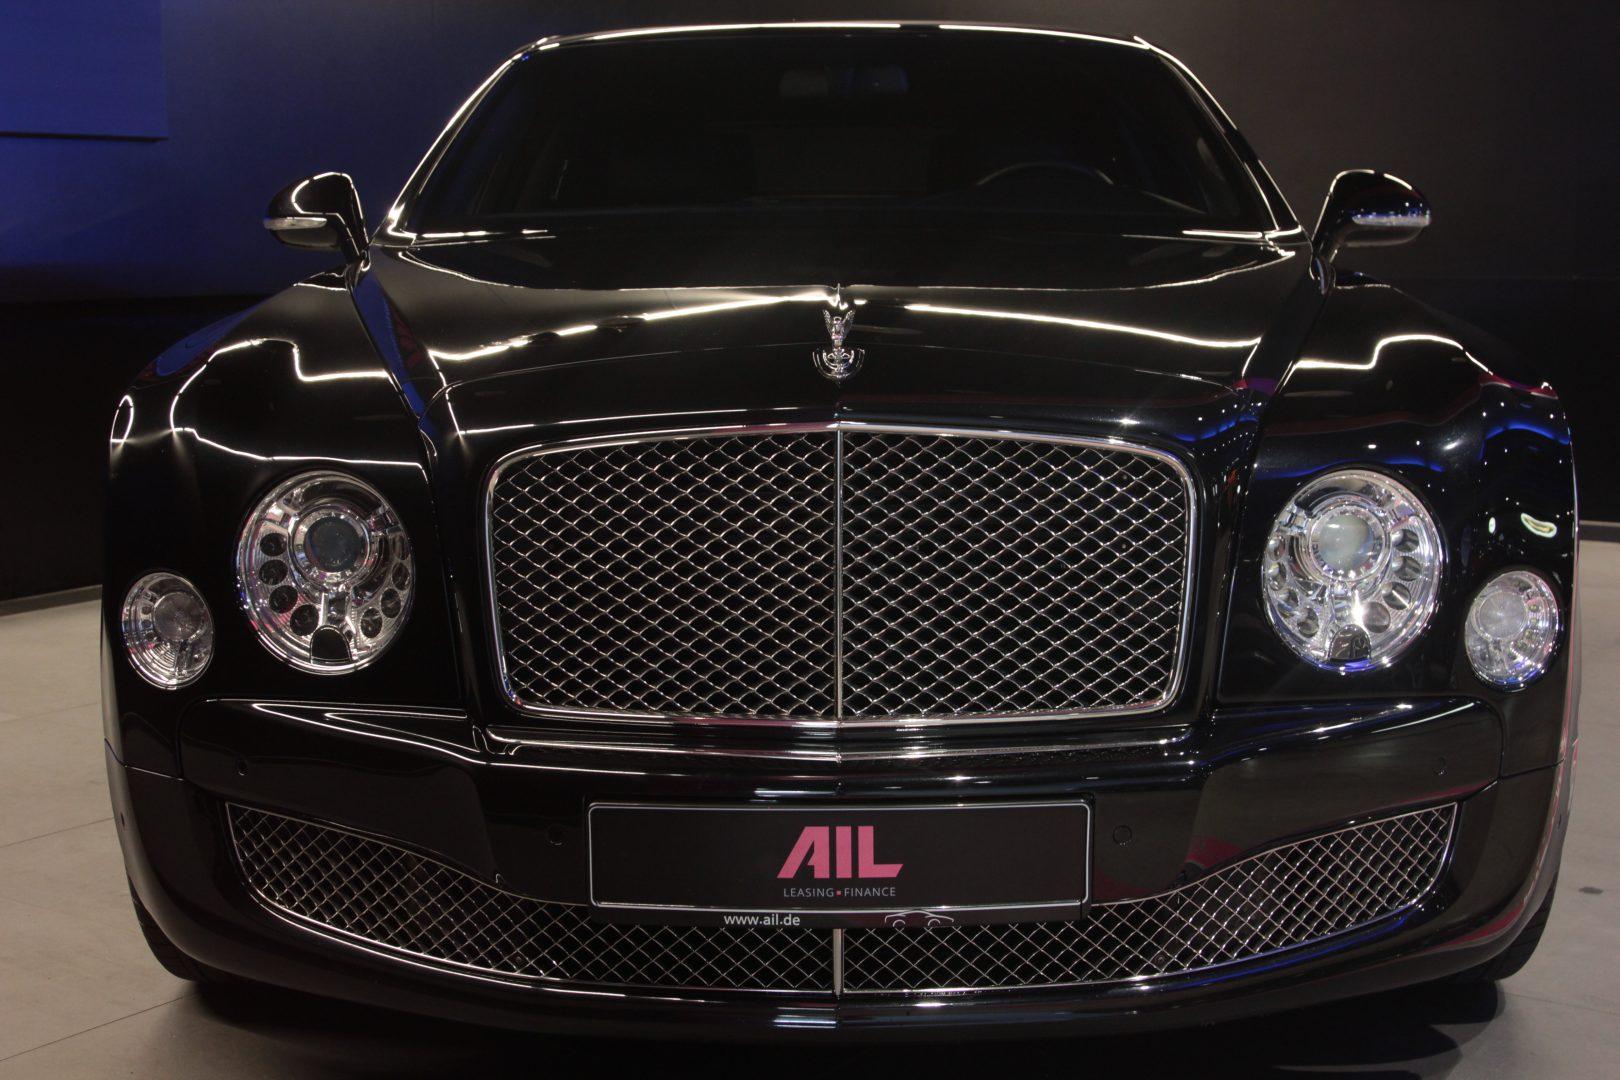 AIL Bentley Mulsanne 4